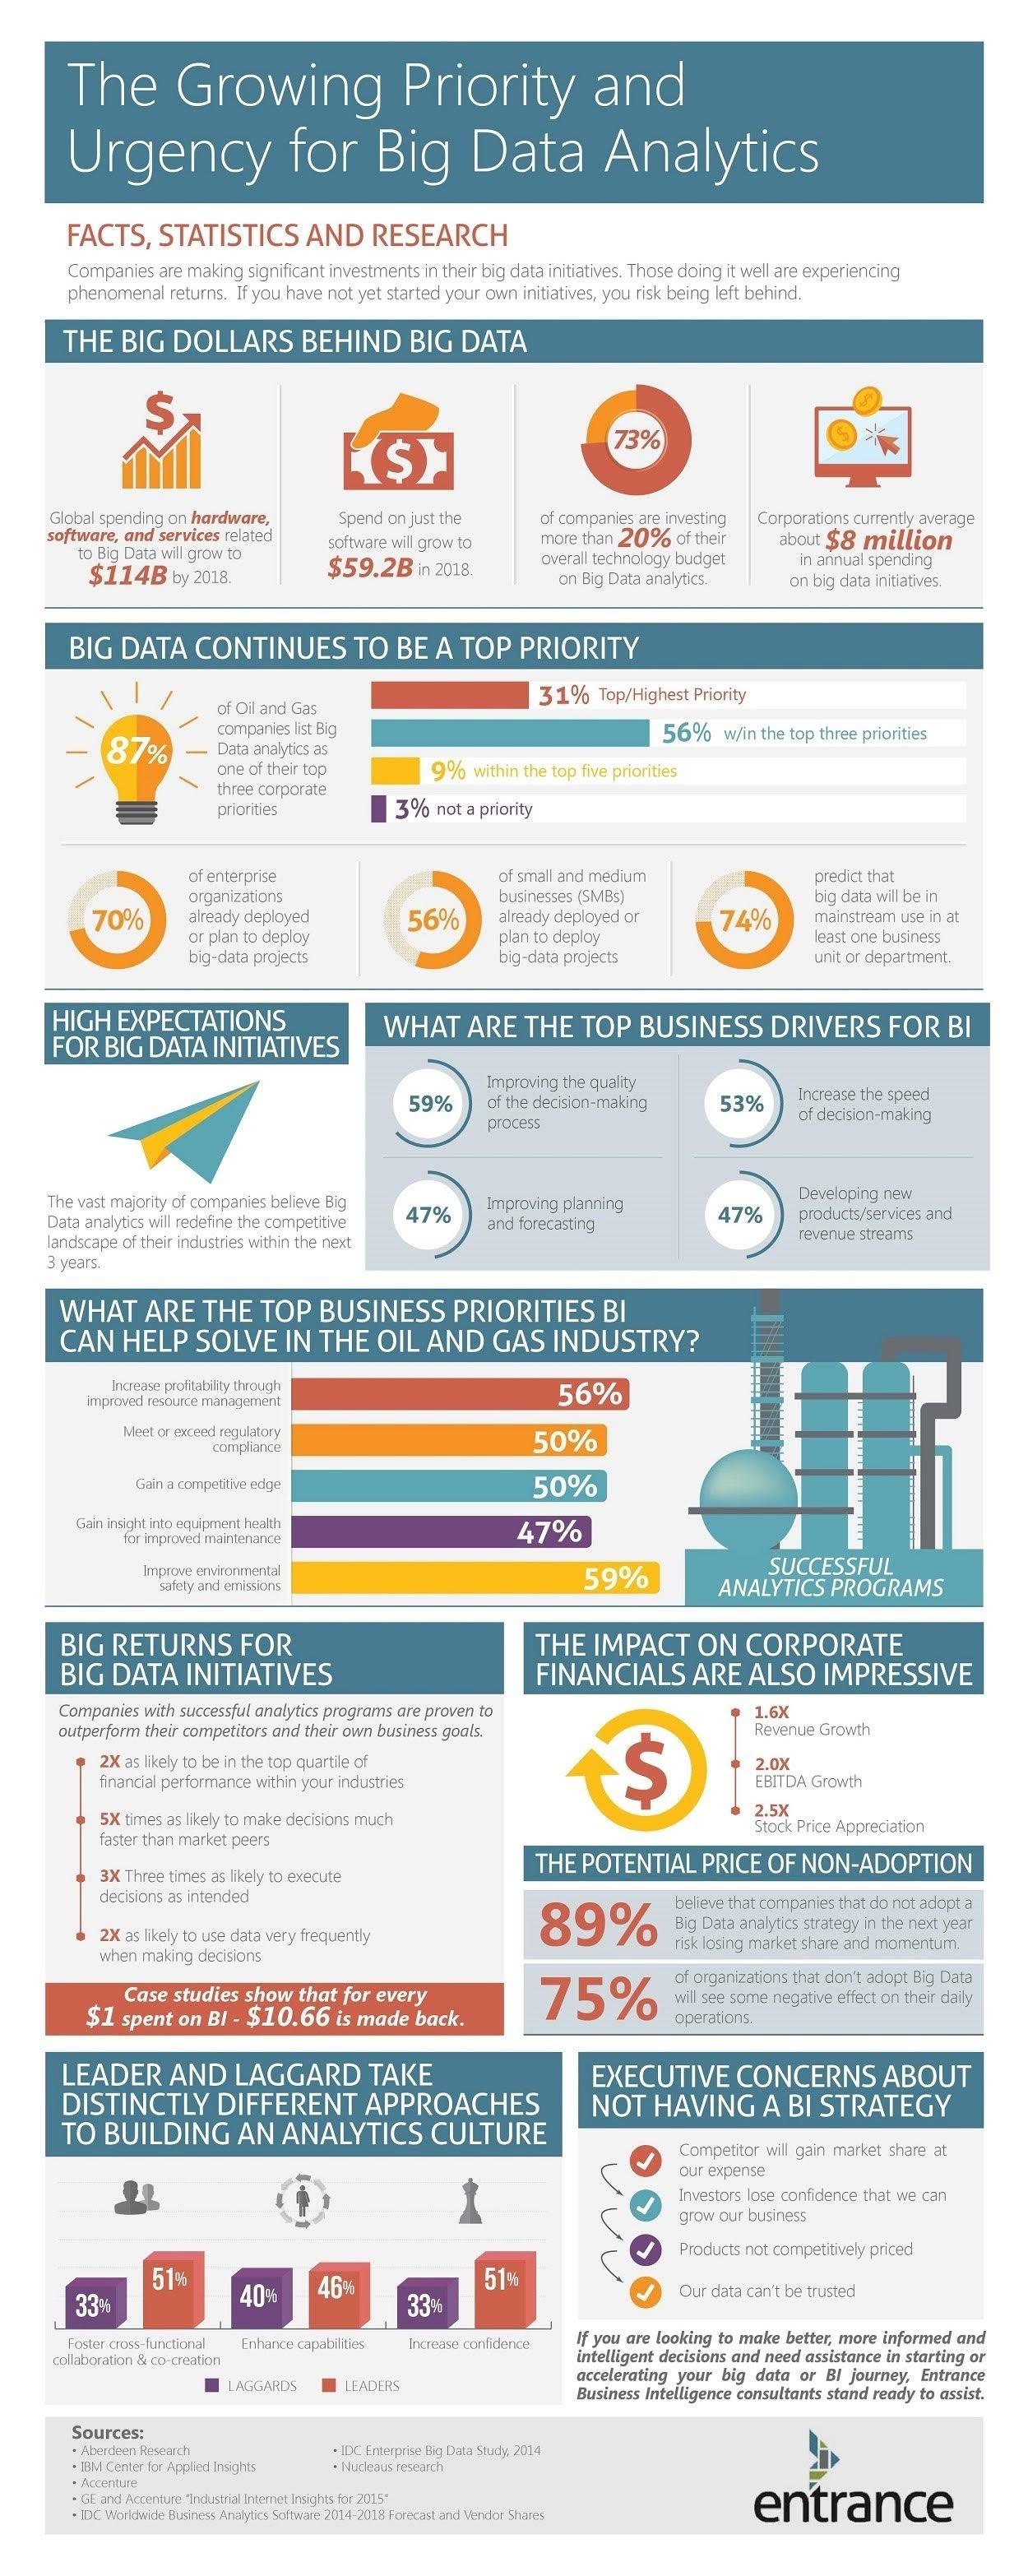 Urgency for Big Data Analytics Infographic #infographic